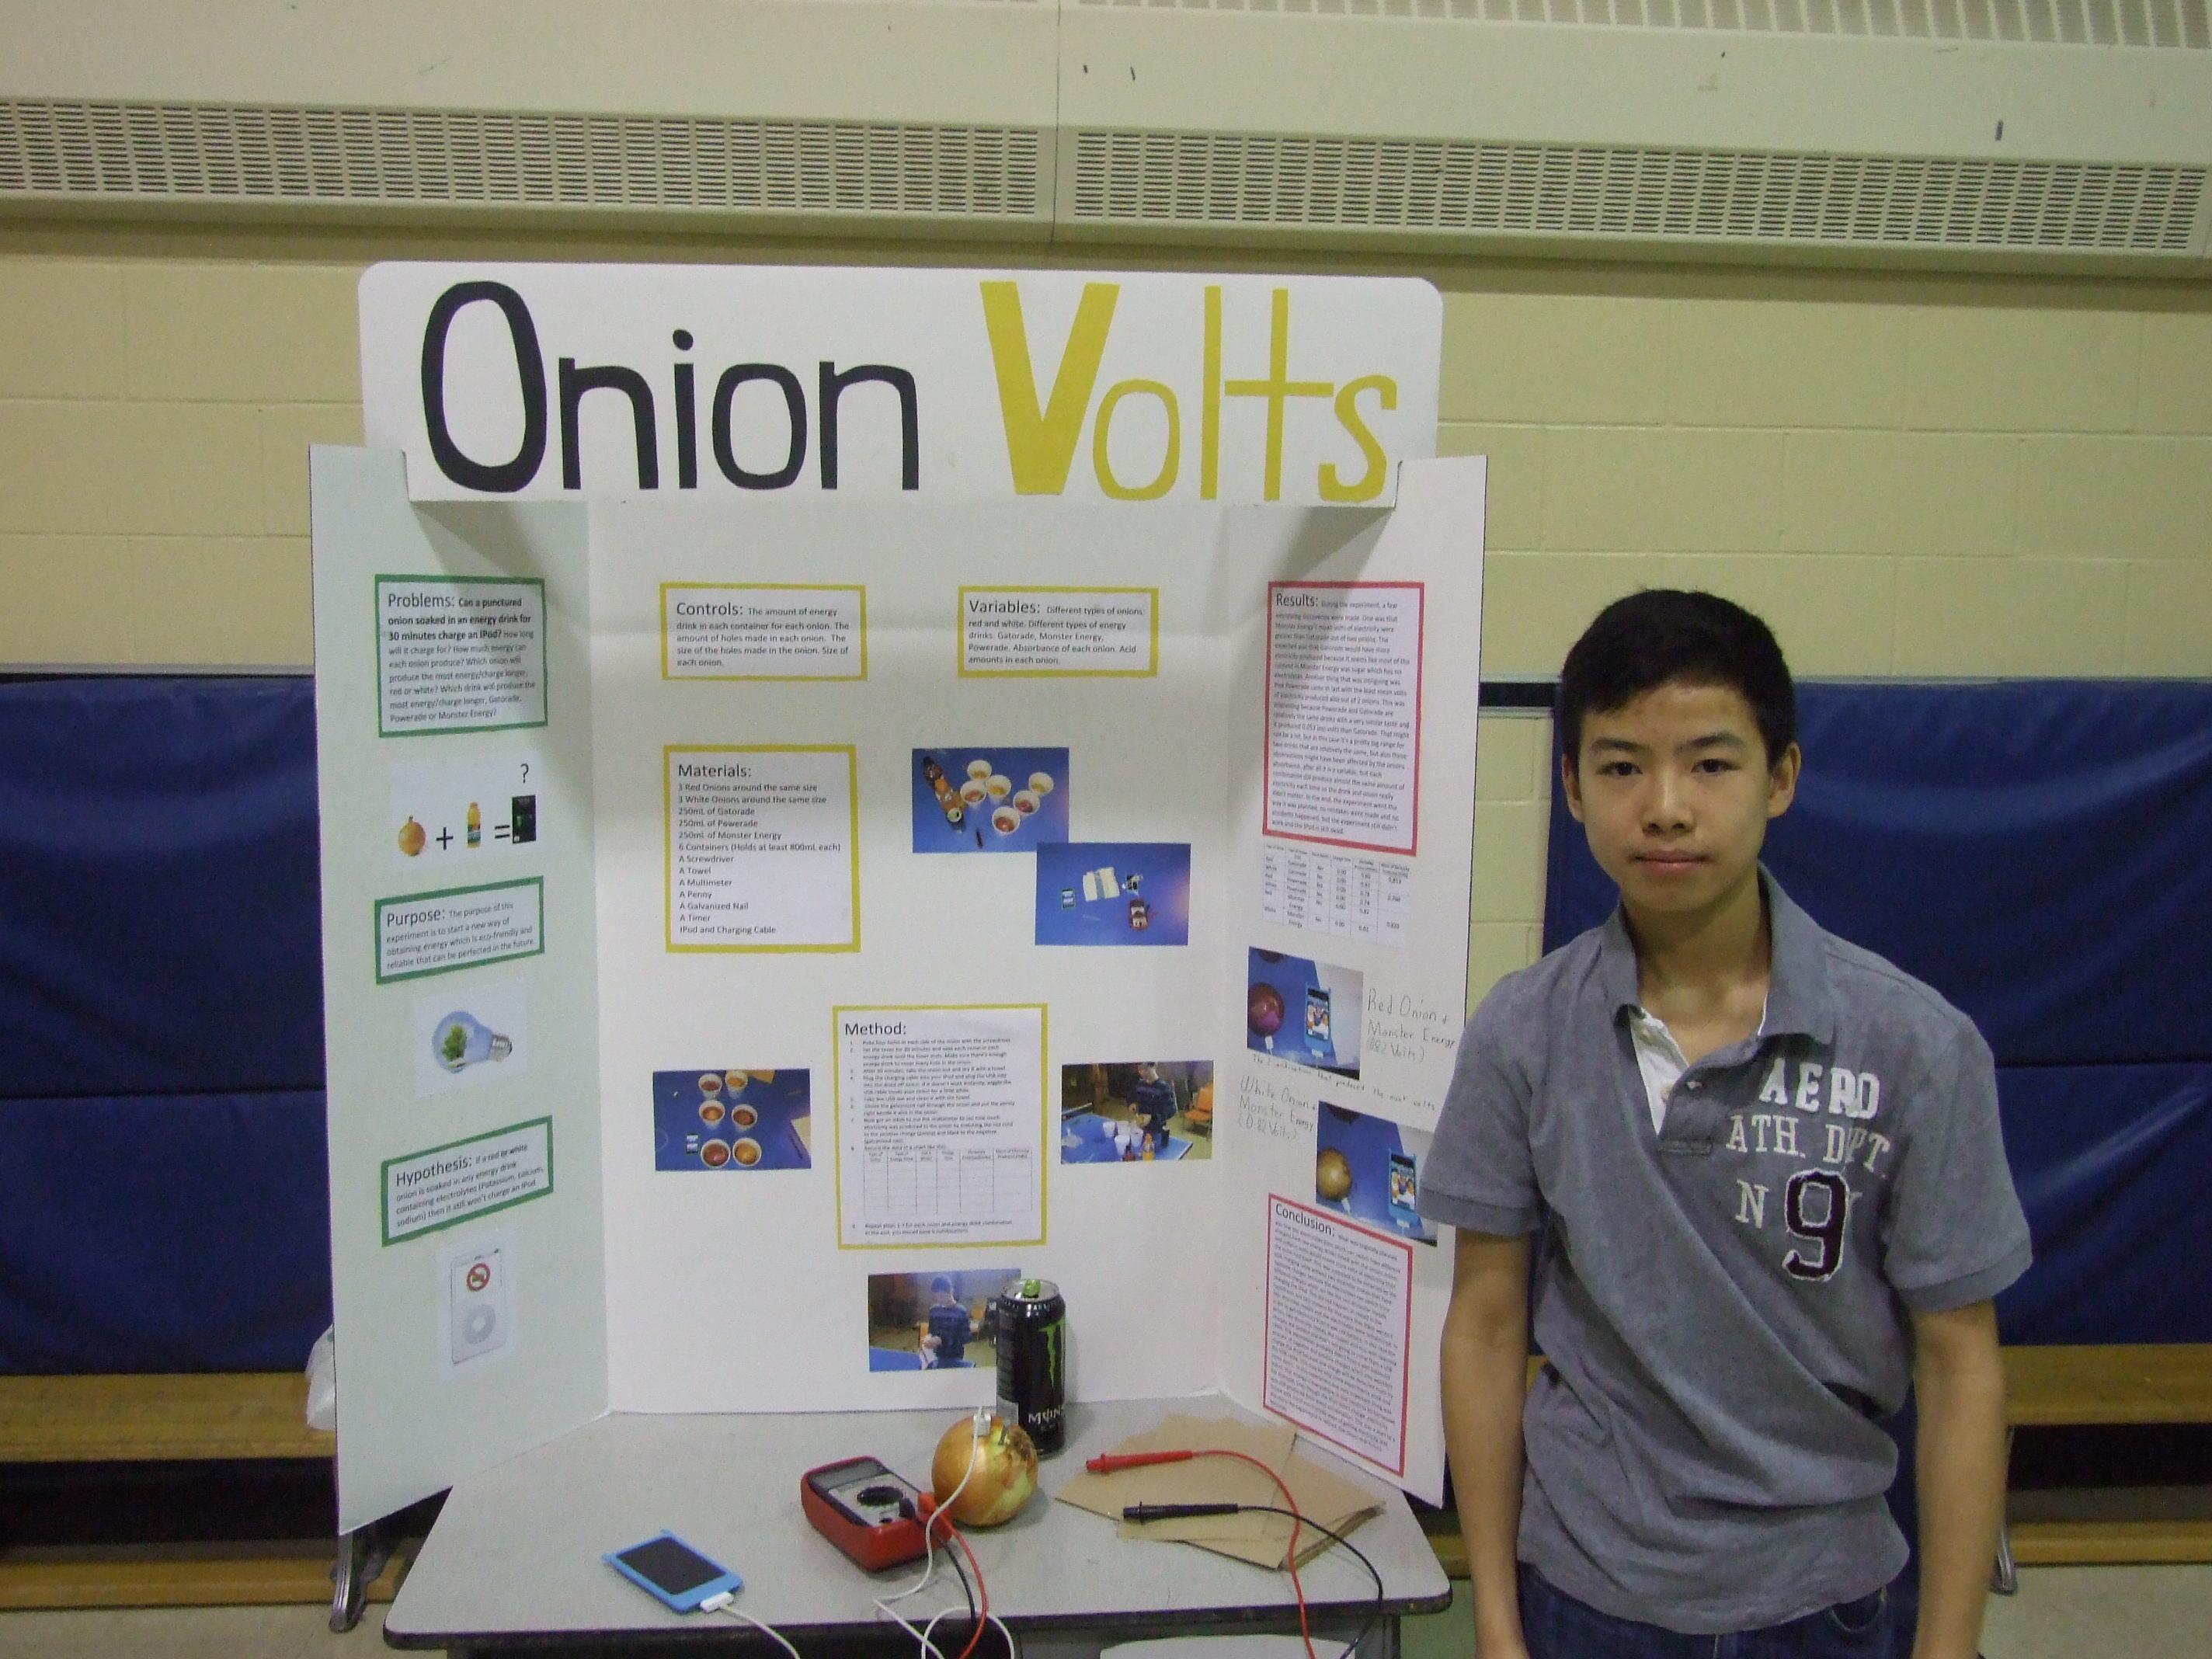 dar essay contest rules